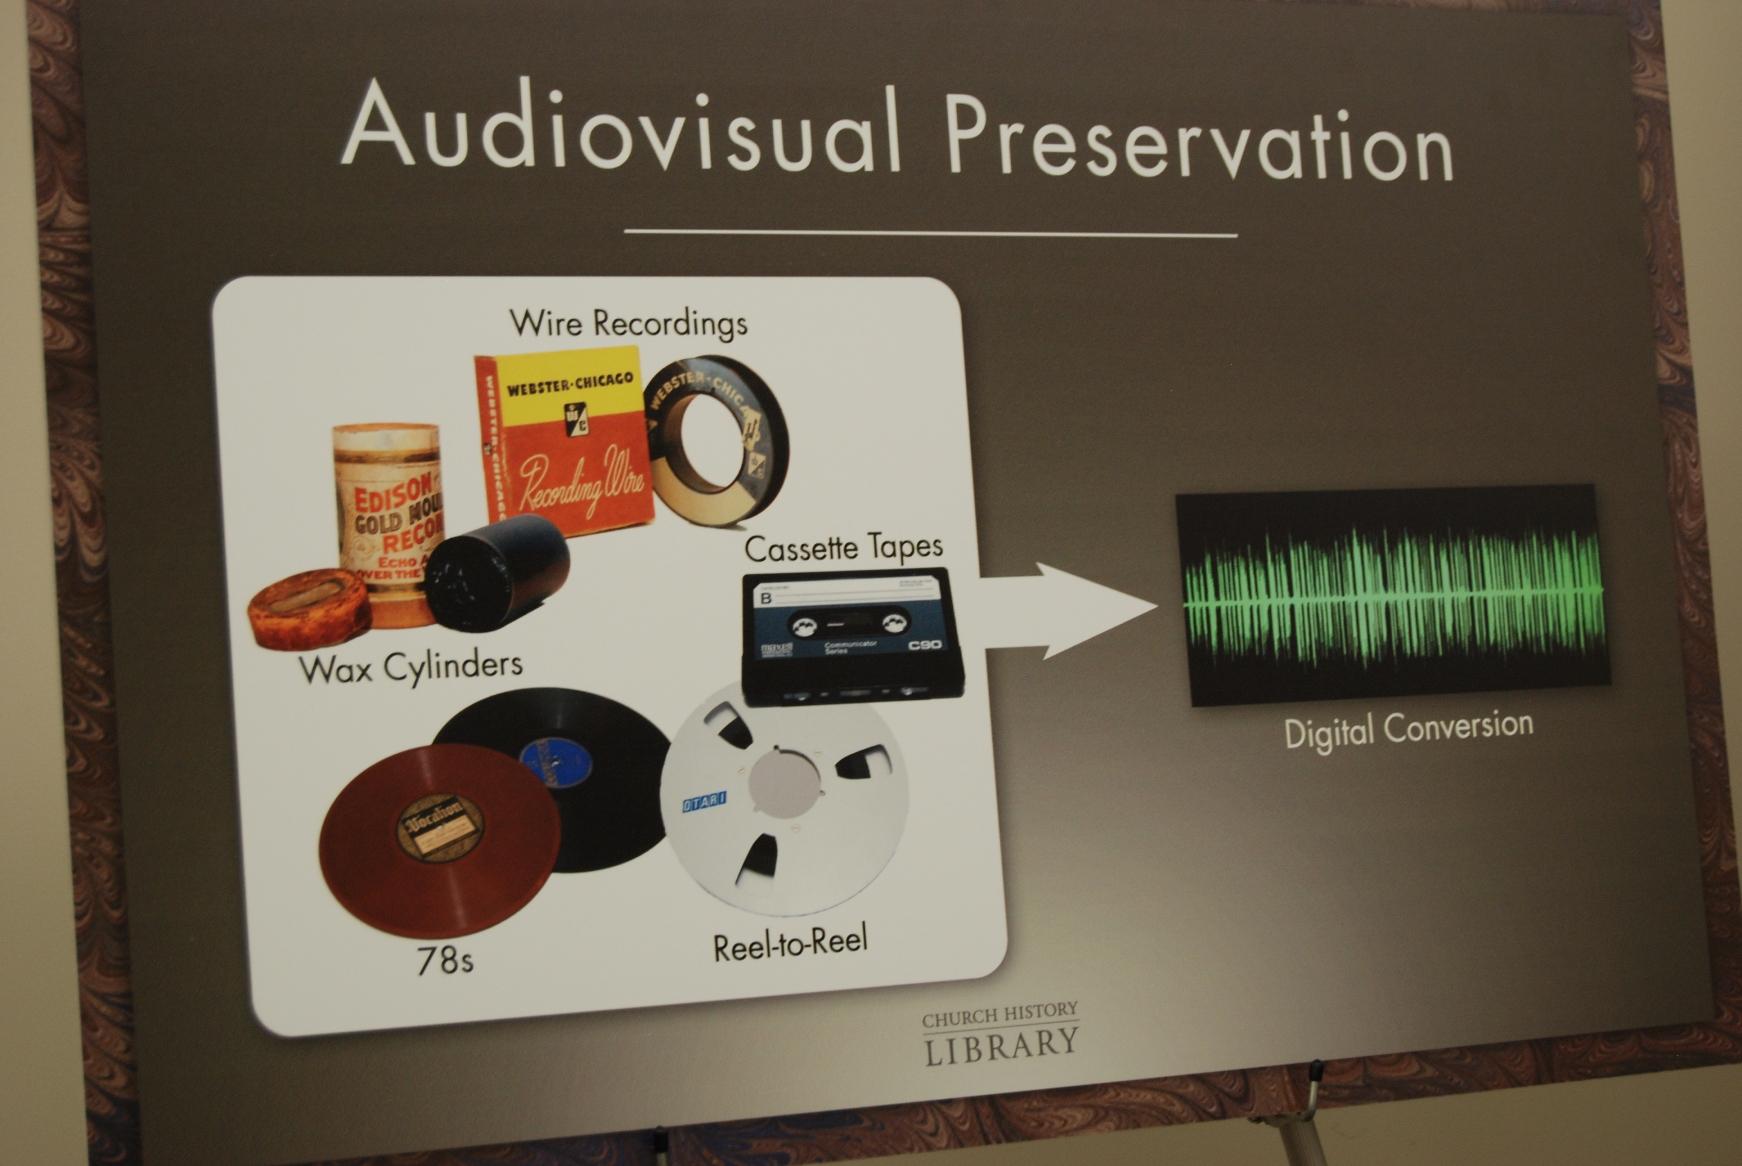 Audiovisual Preservation